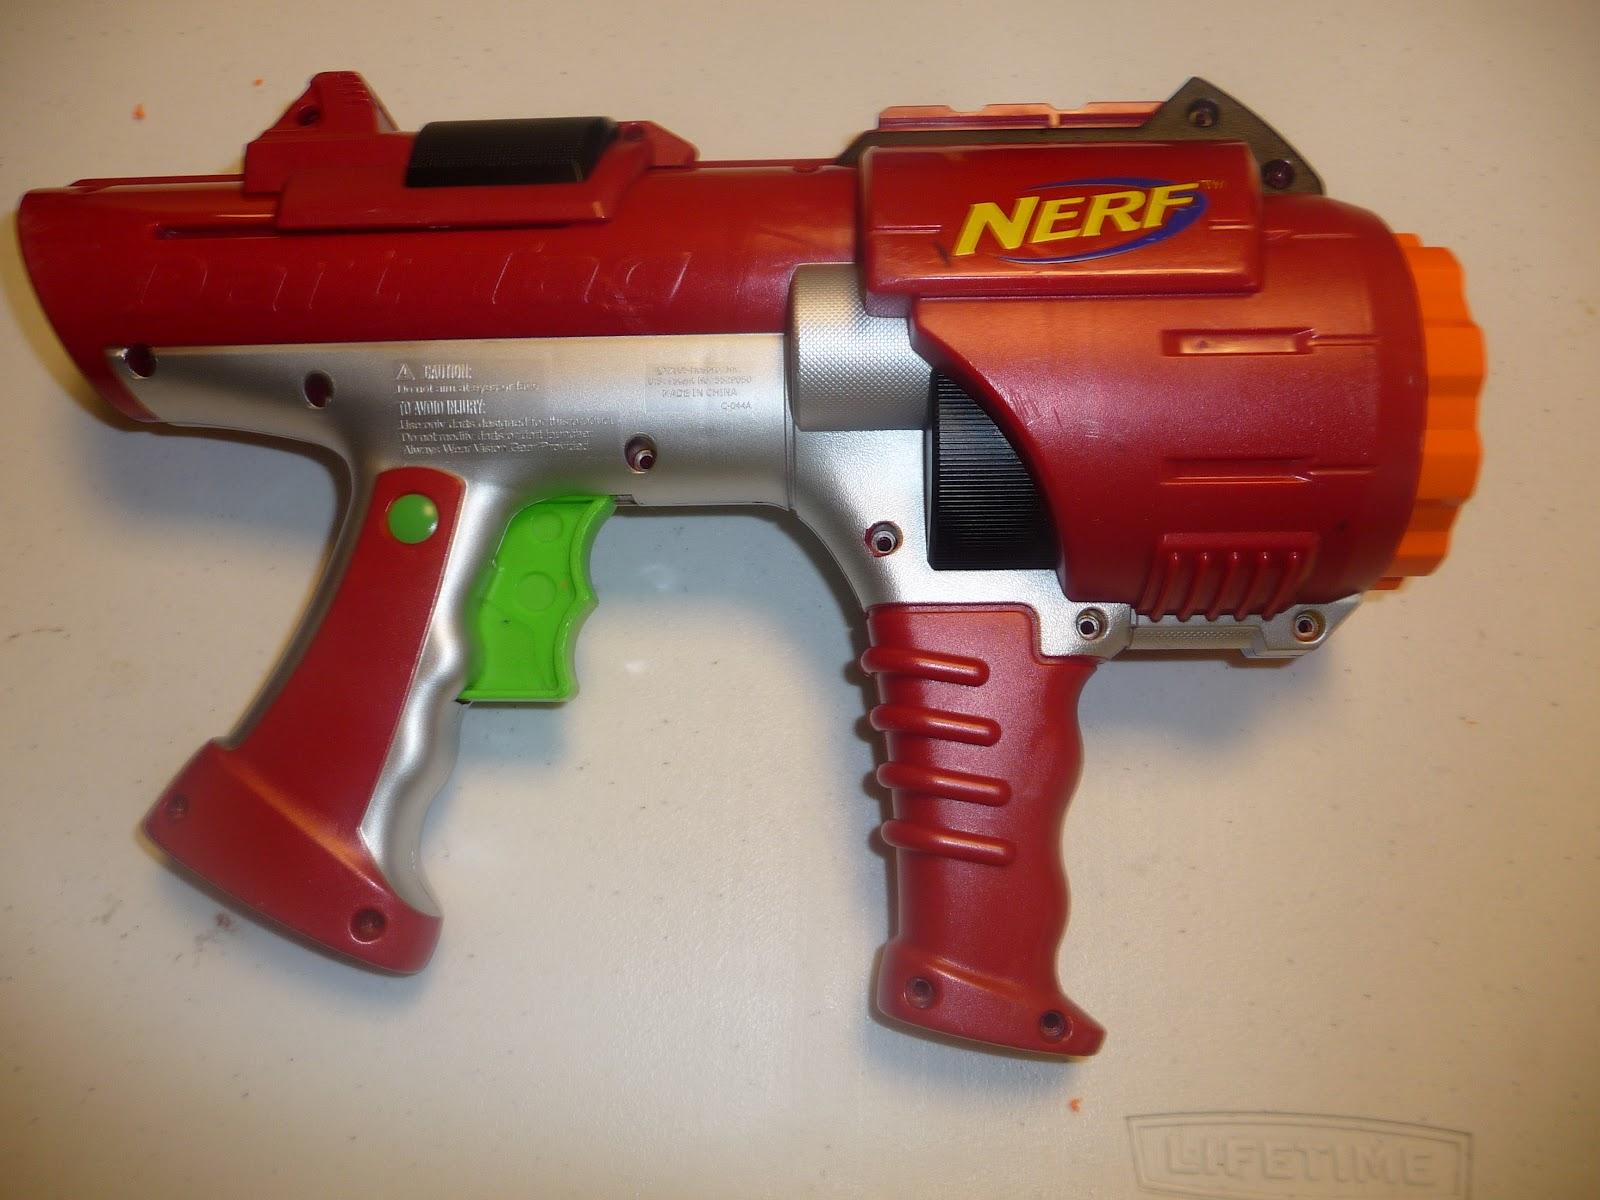 Fobby Mod Works: Nerf Hyperfire Mod Guide  Fobby Mod Works...